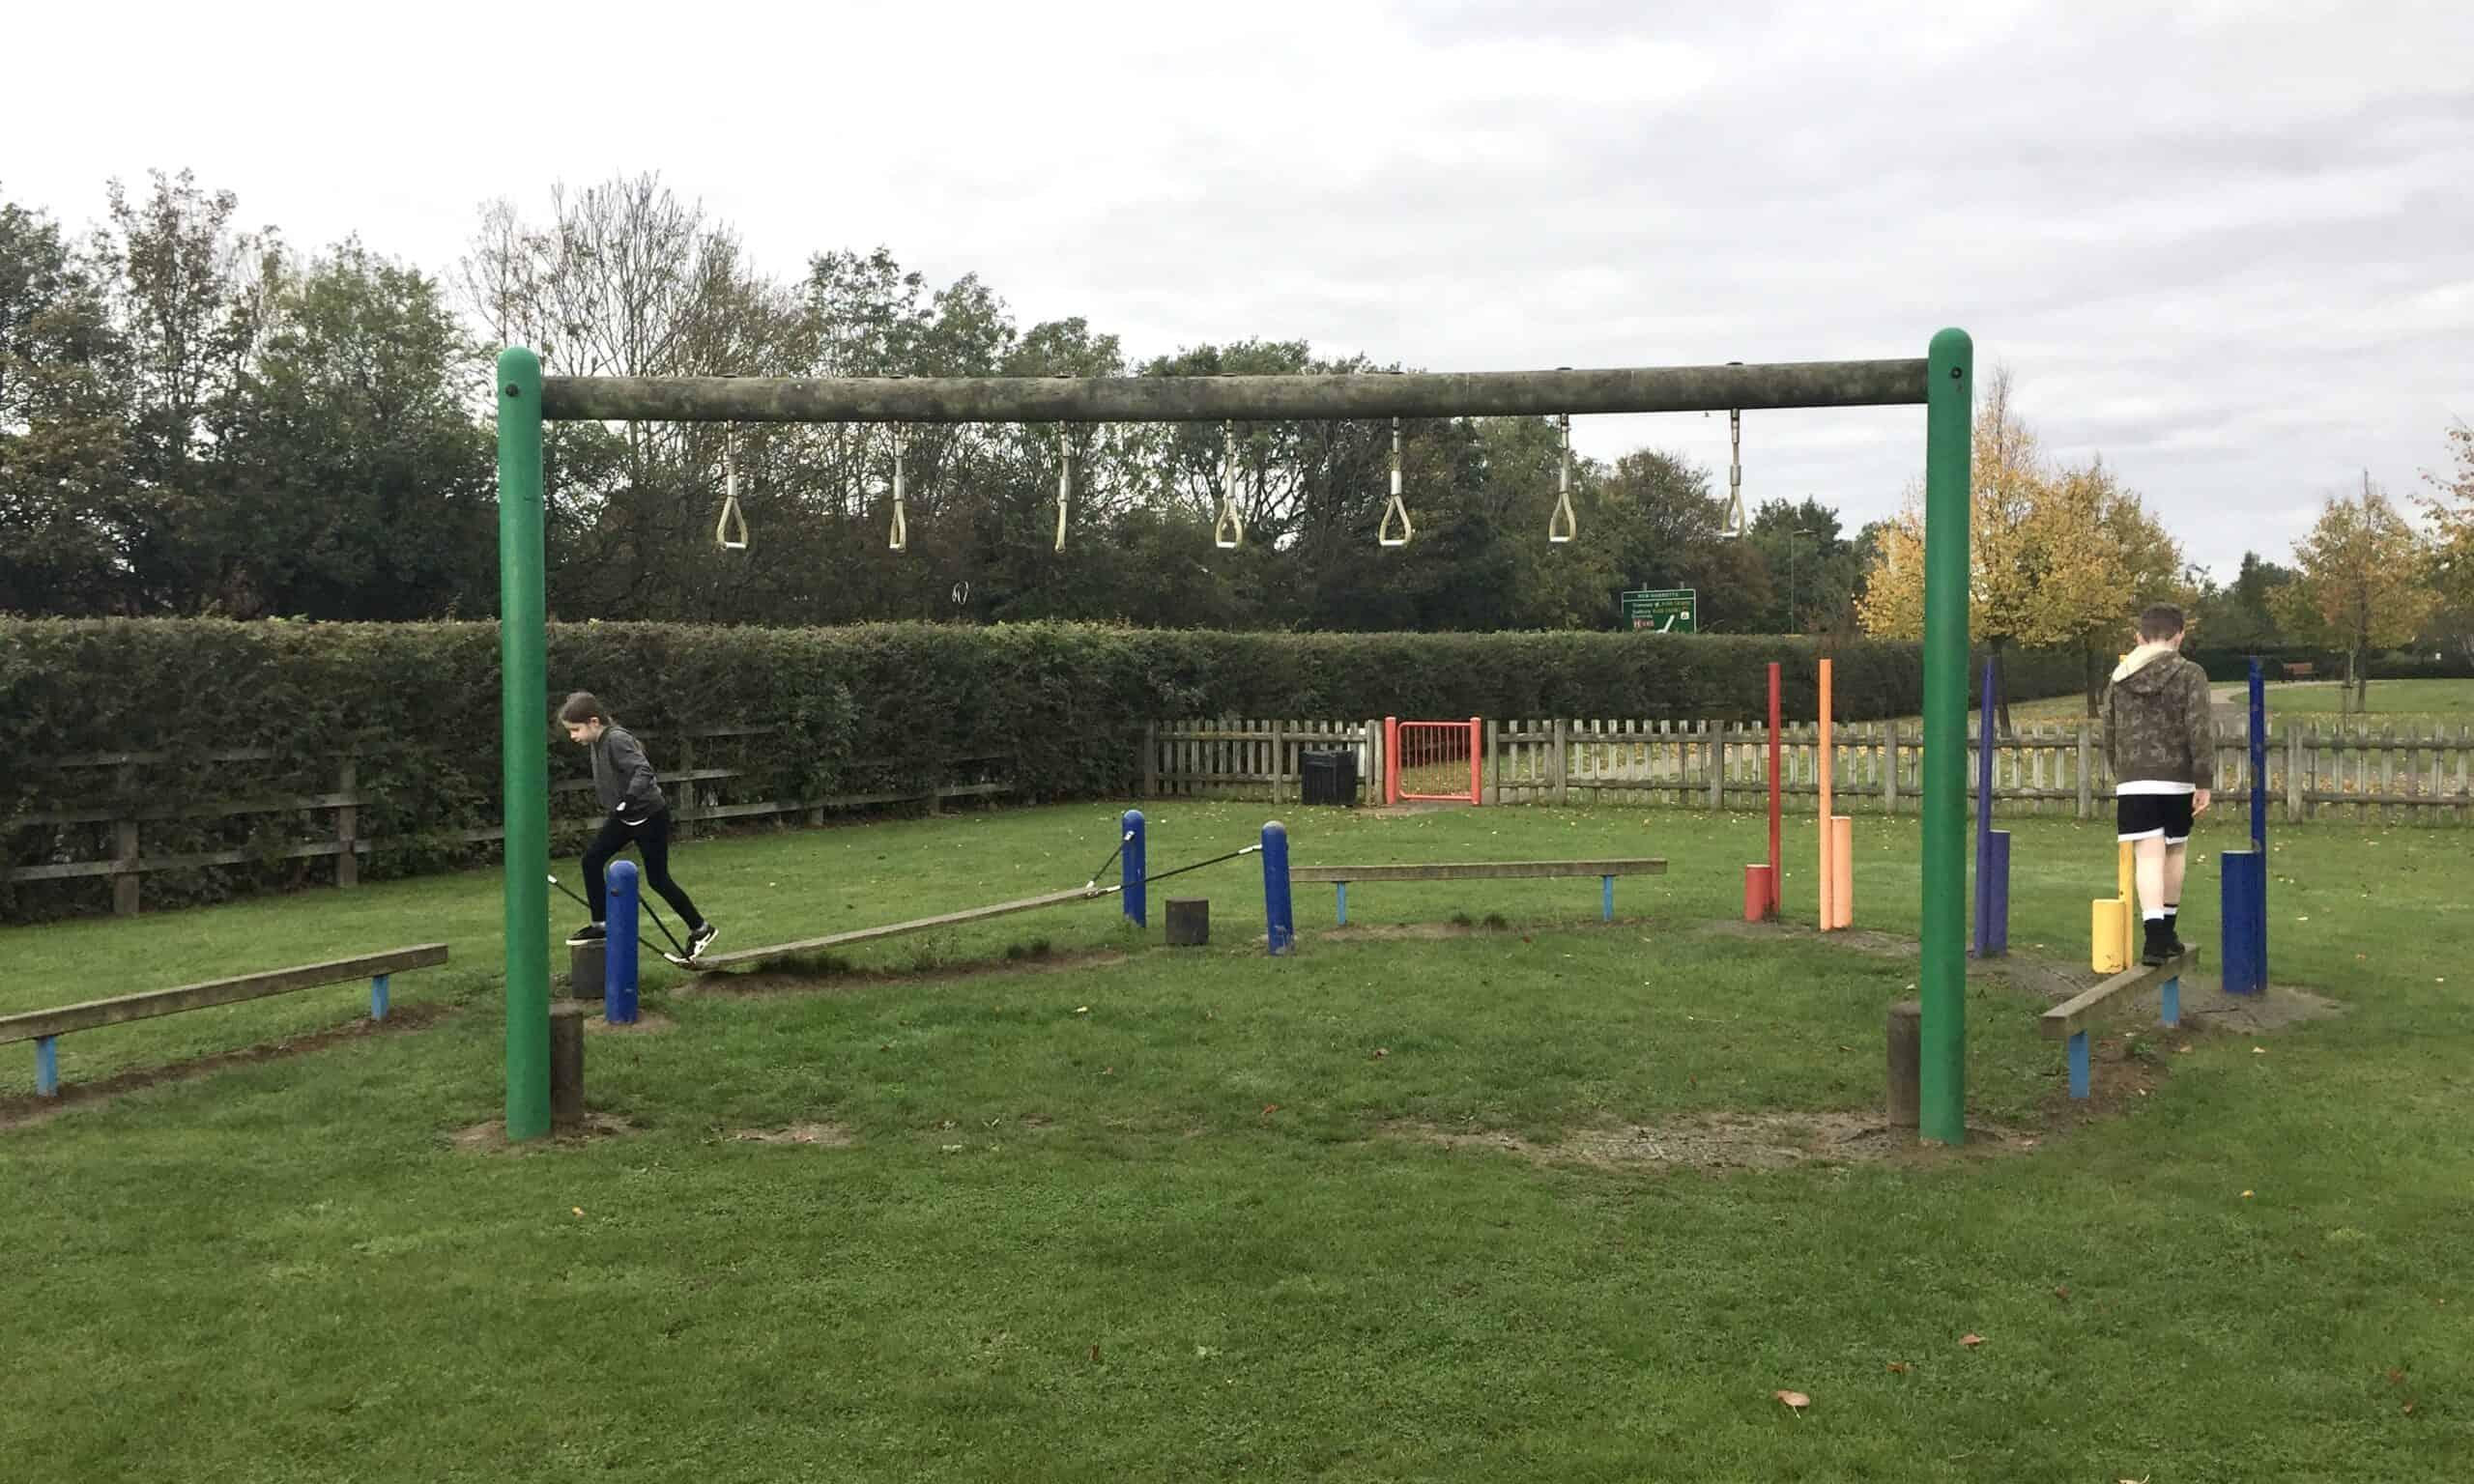 The obstacle area at Boleyn Gardens